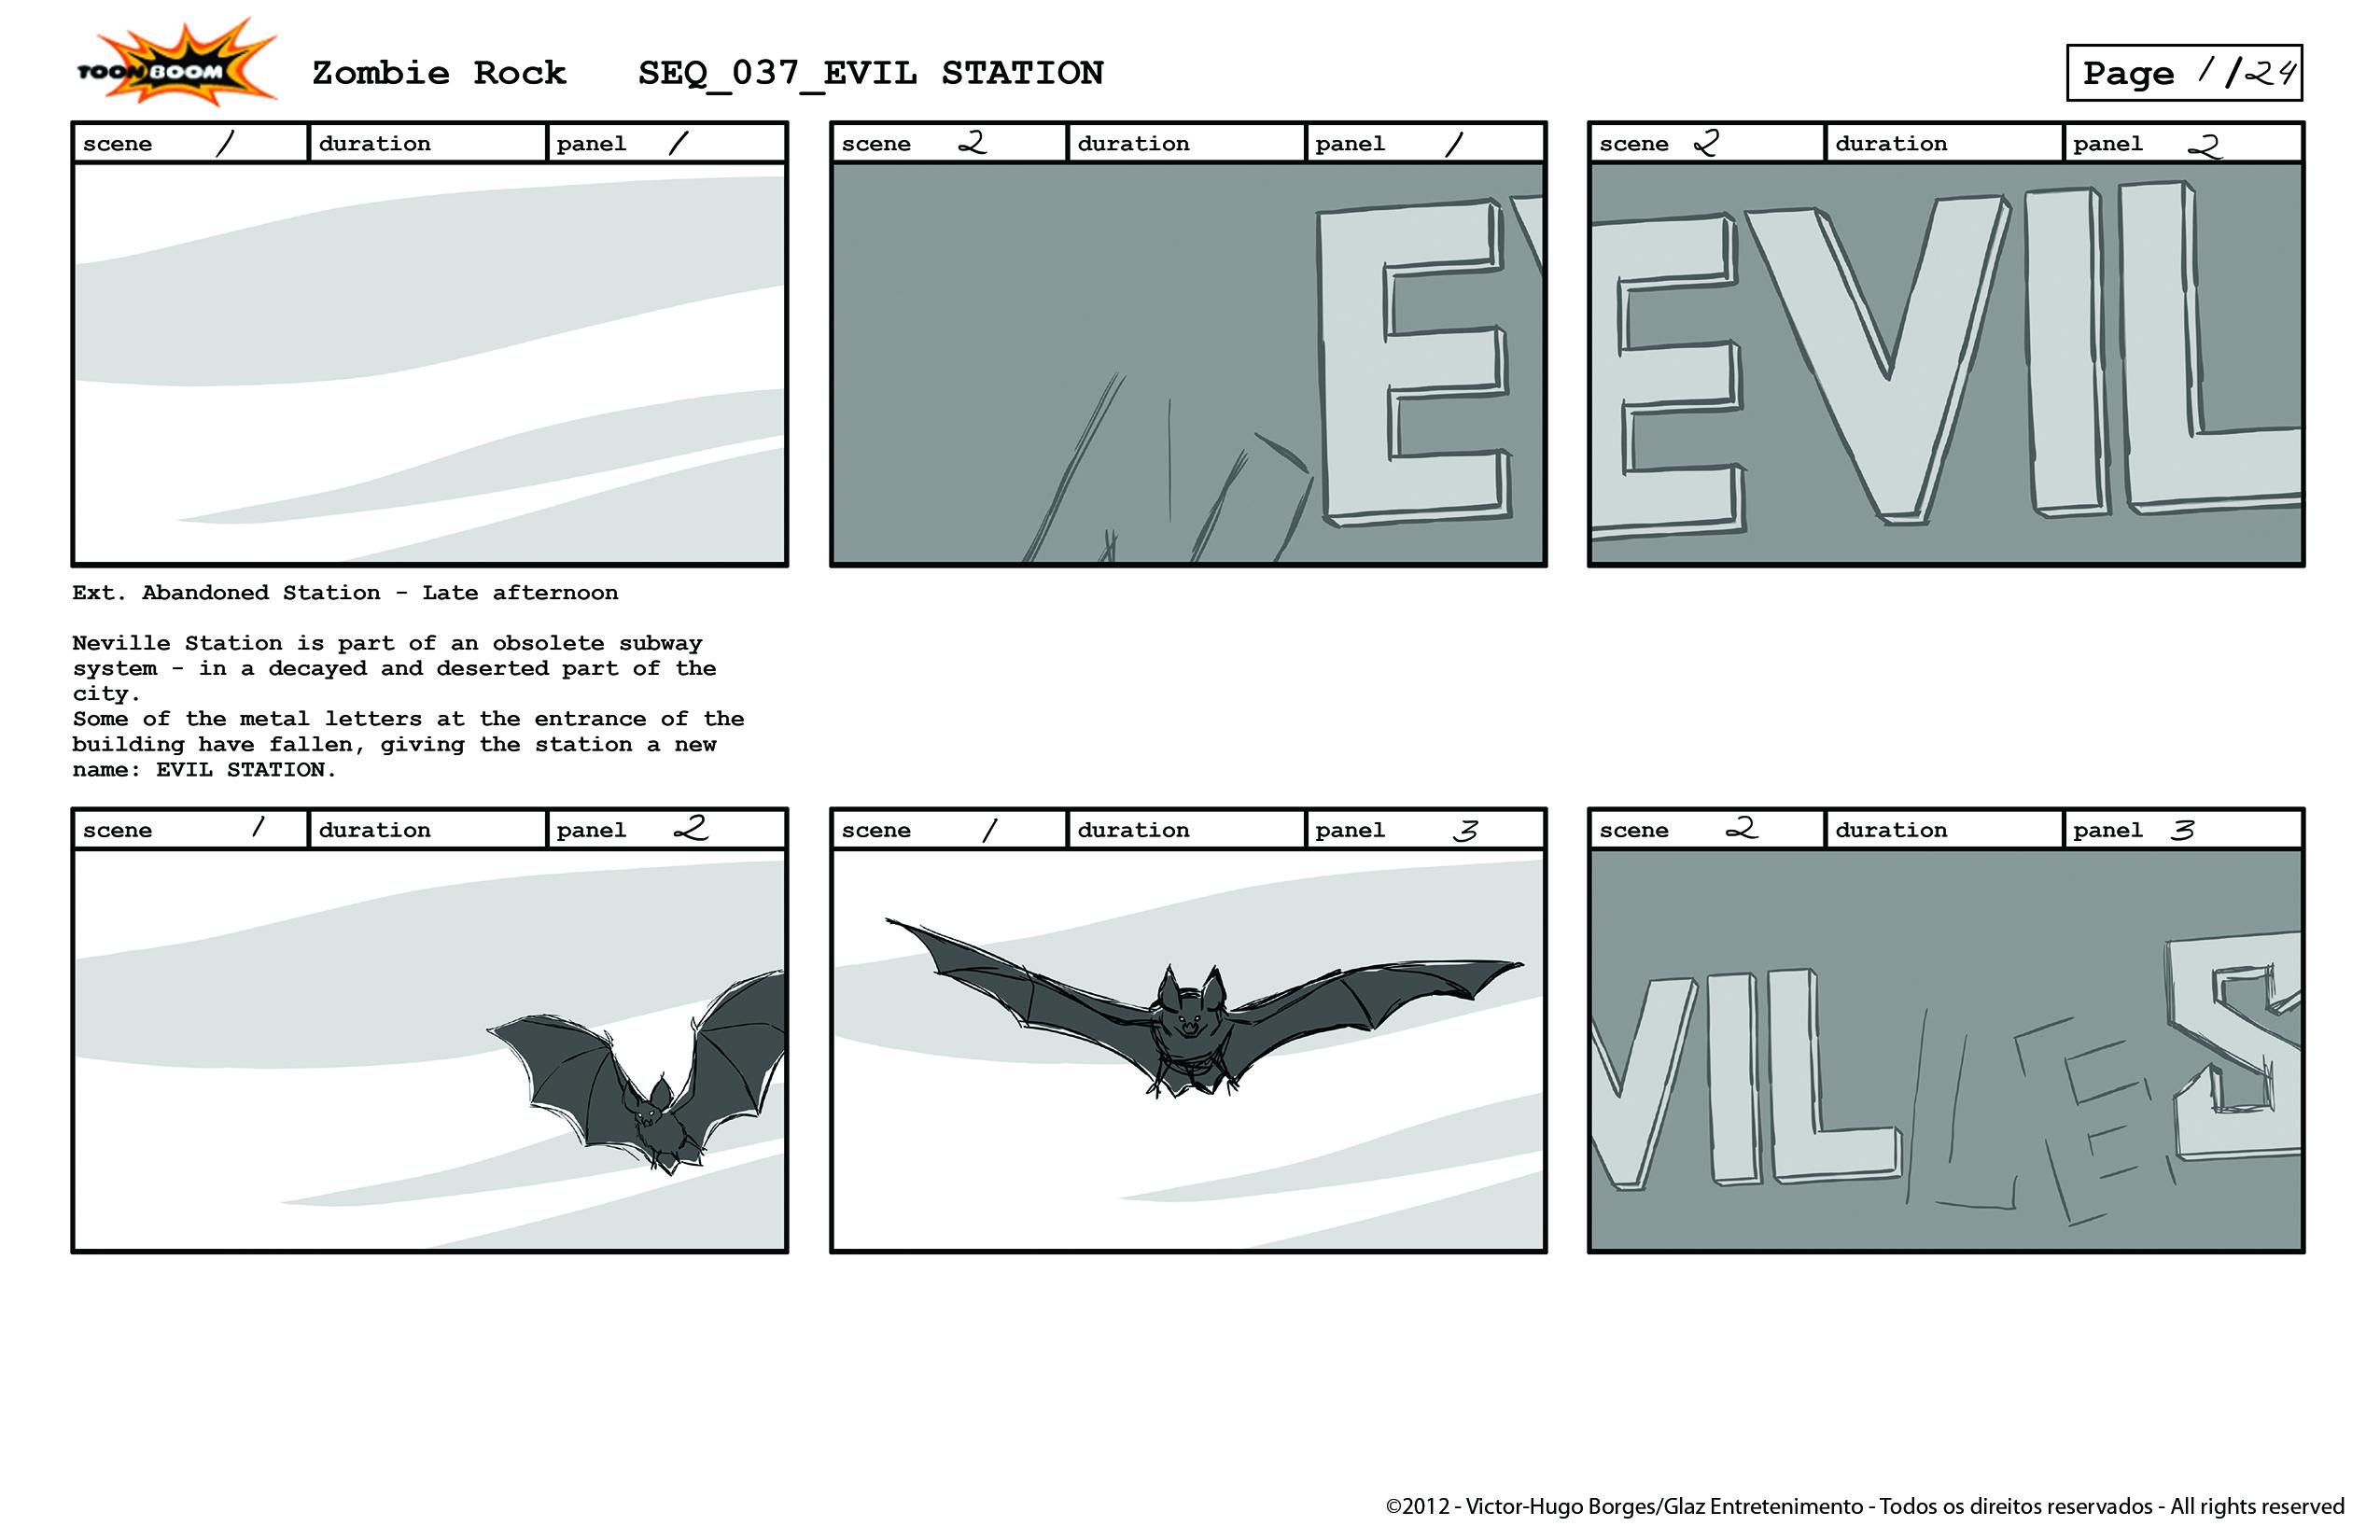 SEQ037_Evil Station_page01